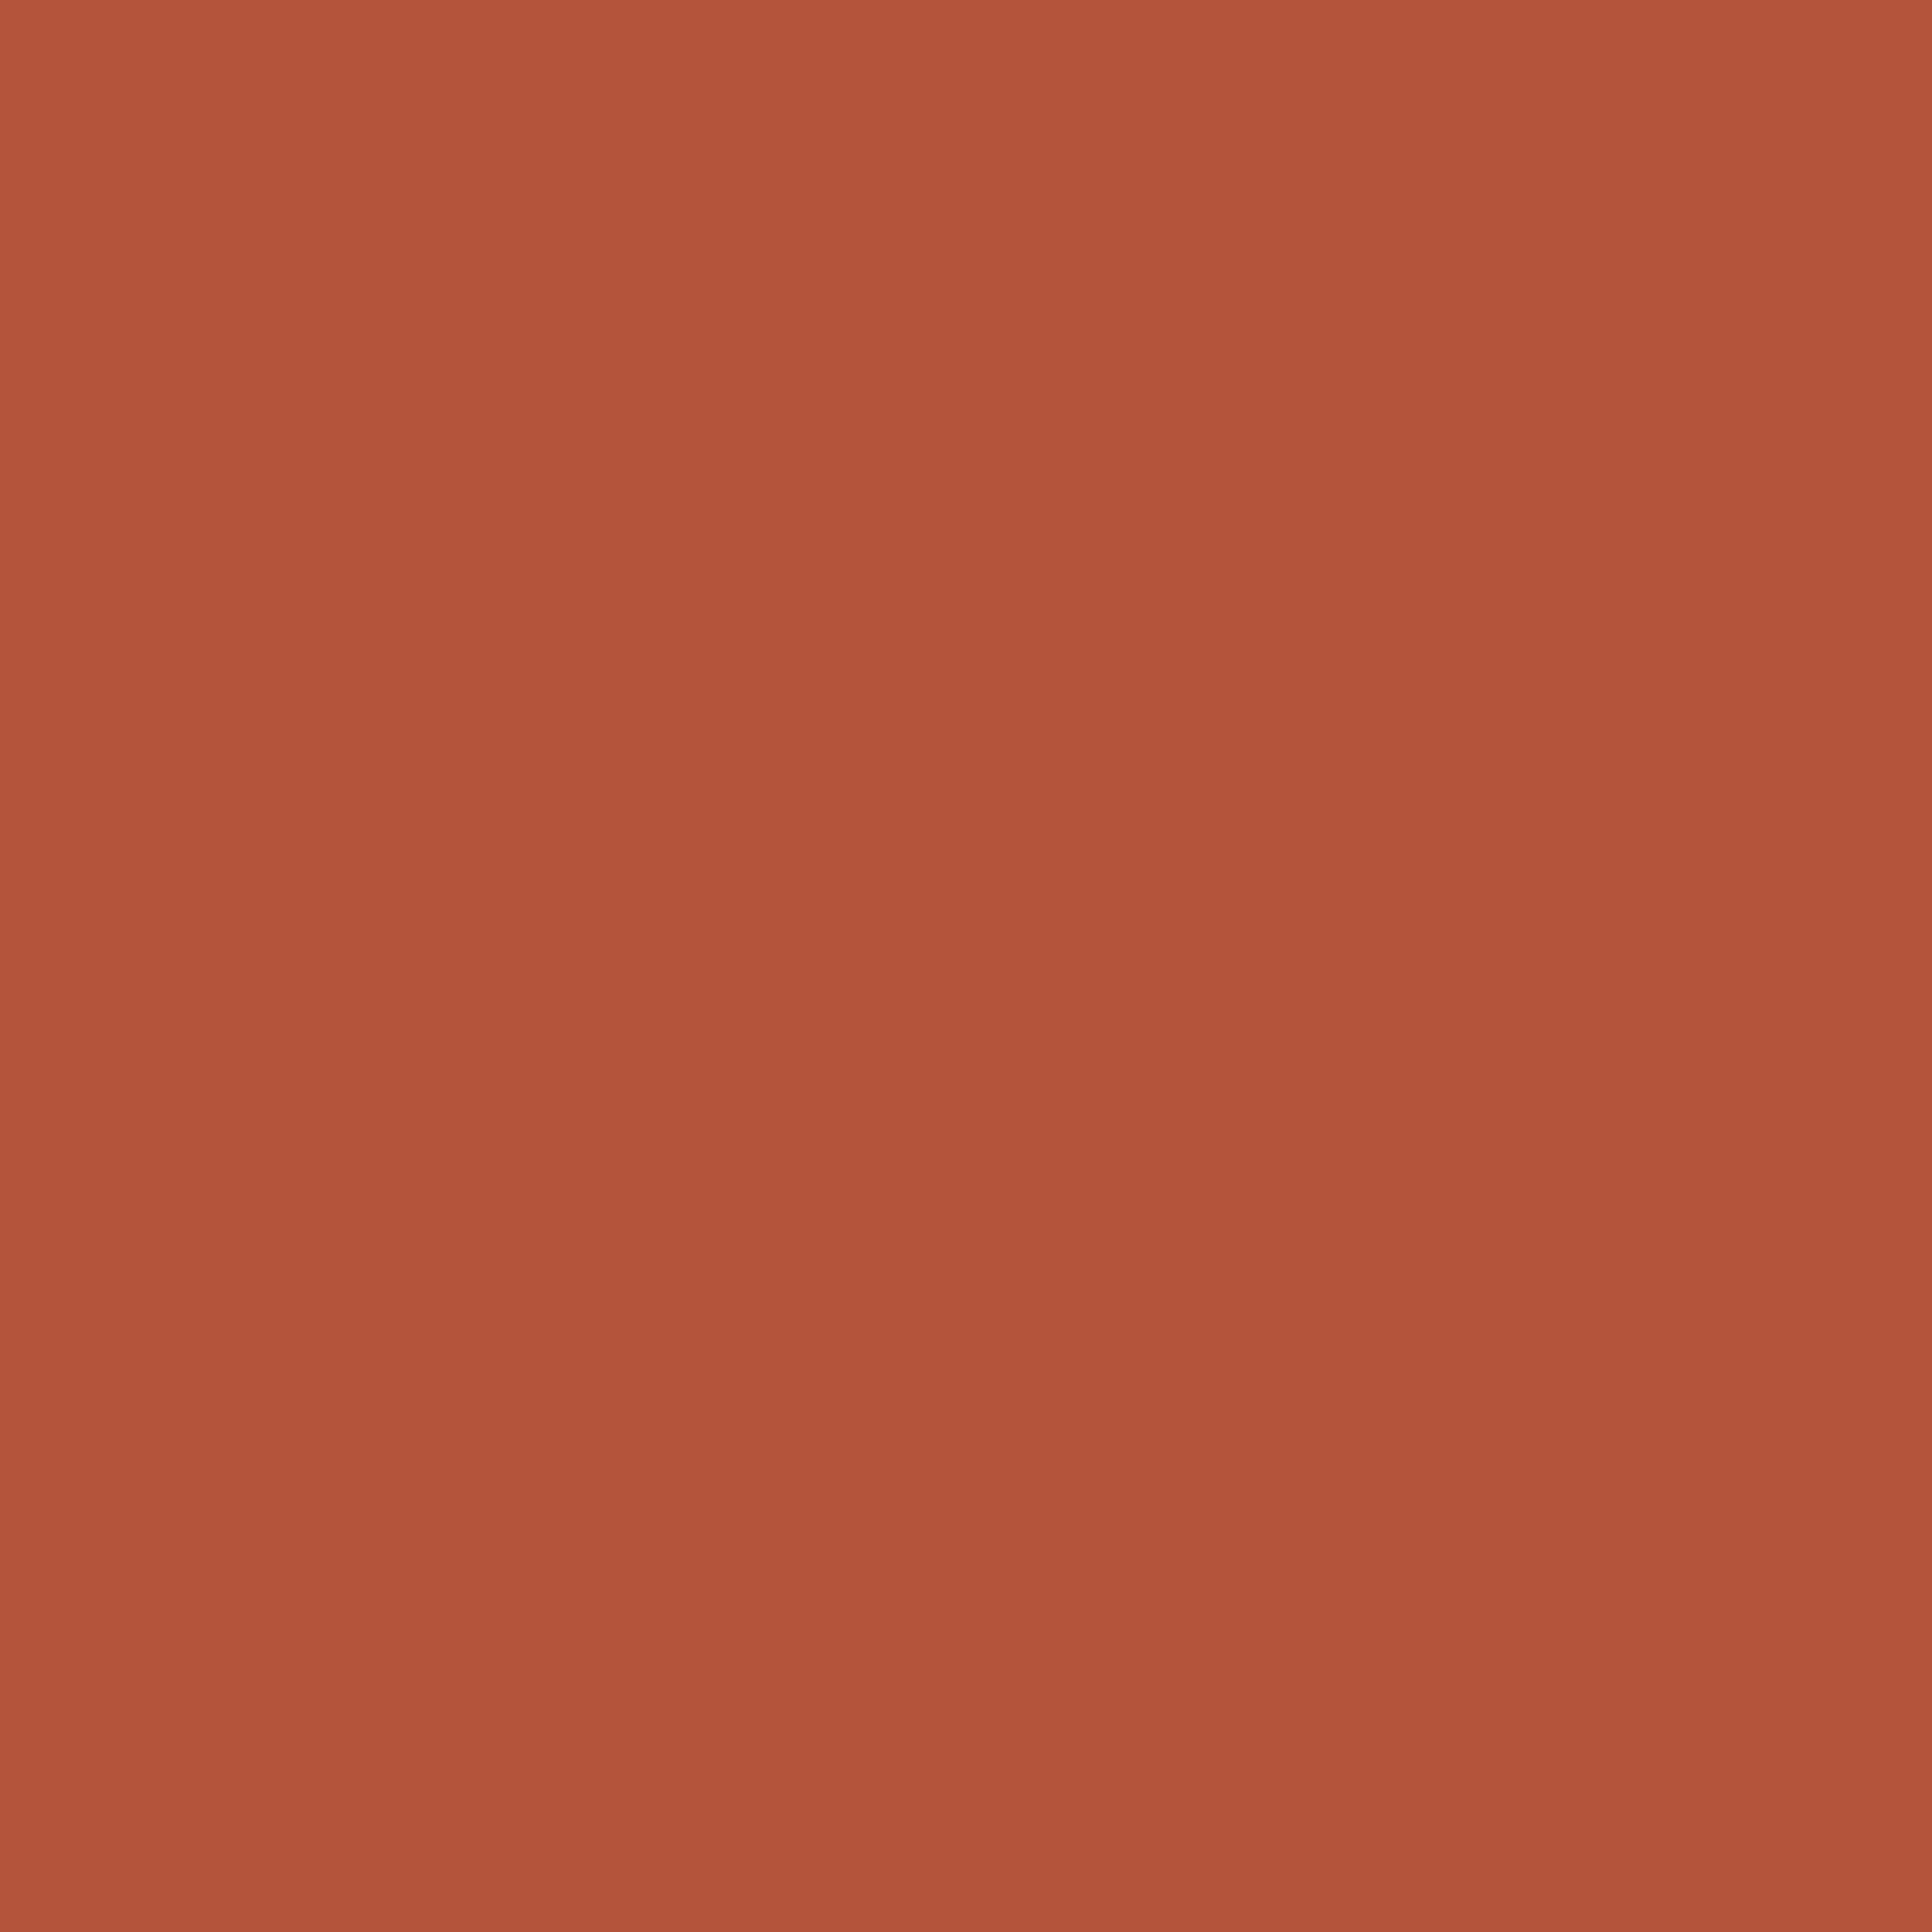 Rowan red-melange